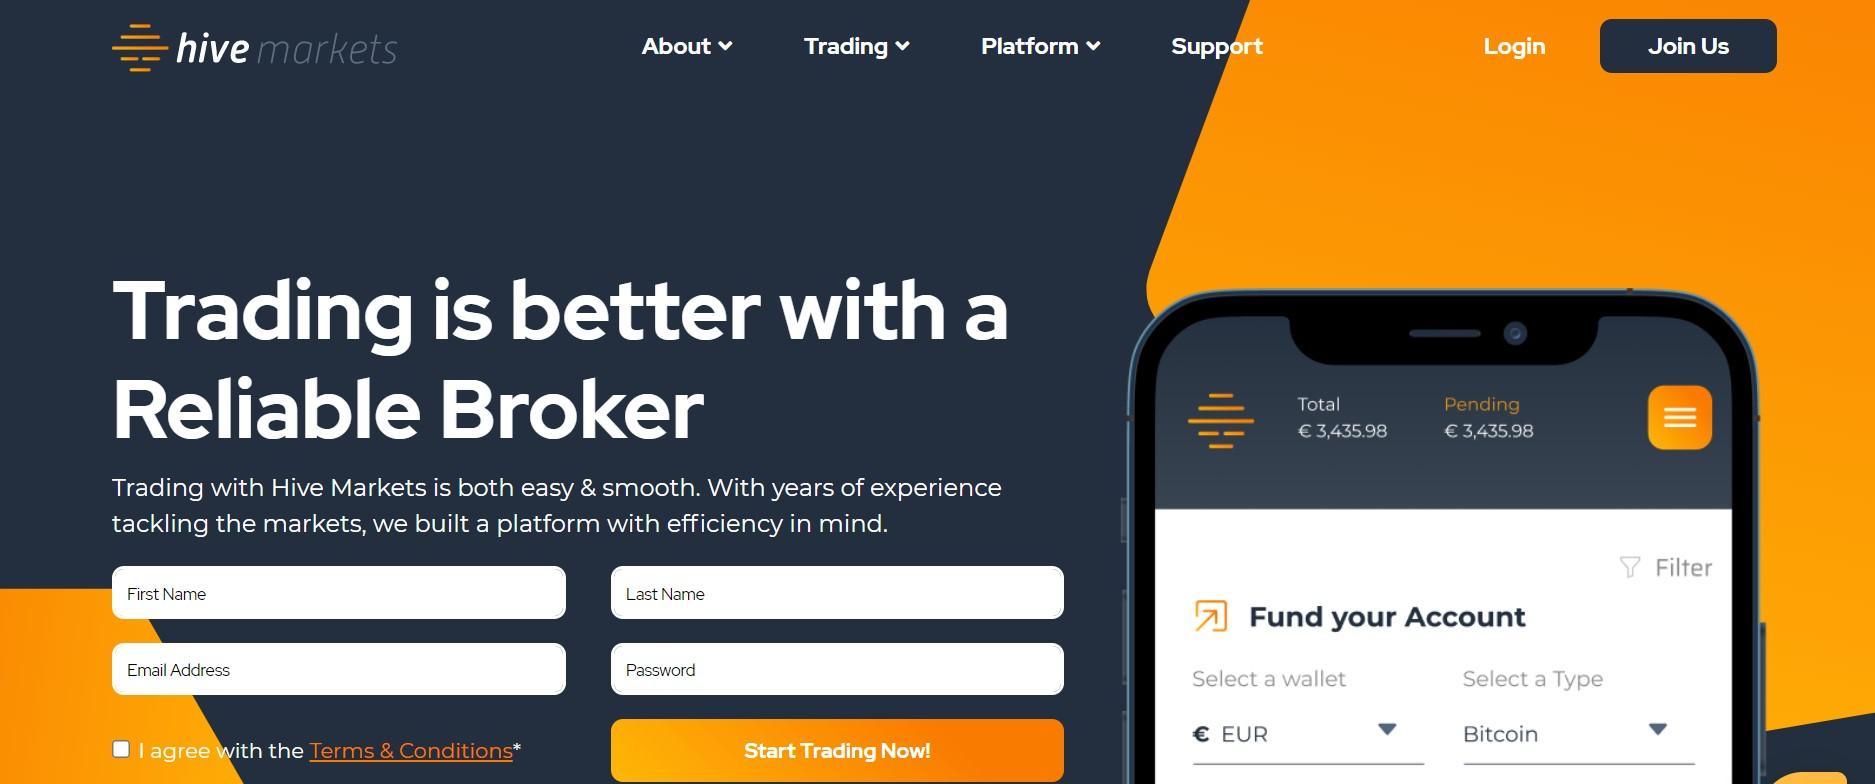 Hive Markets website